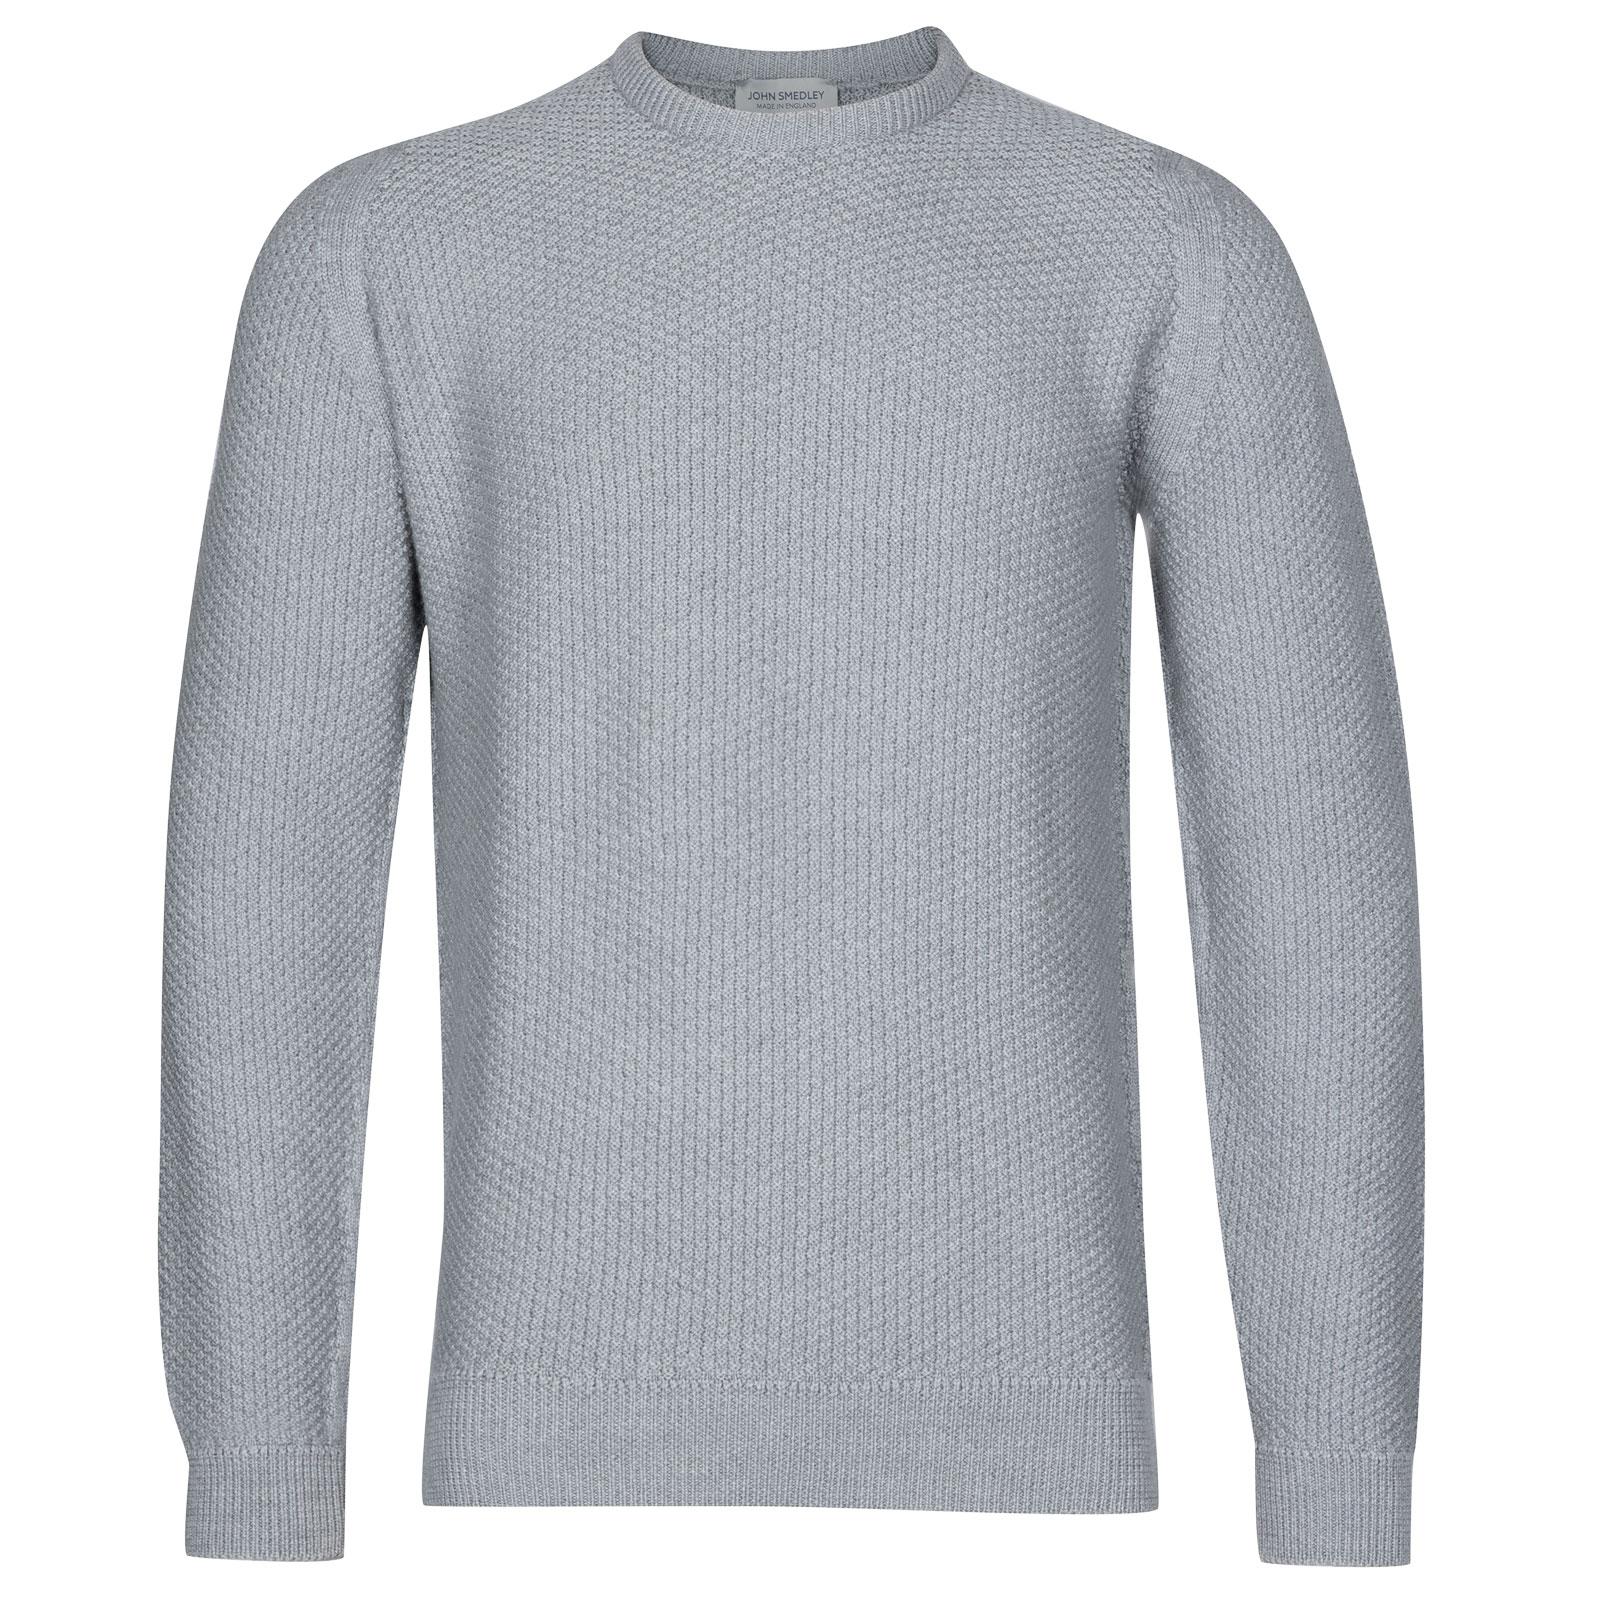 John Smedley 8Singular Merino Wool Pullover in Bardot Grey-XXL